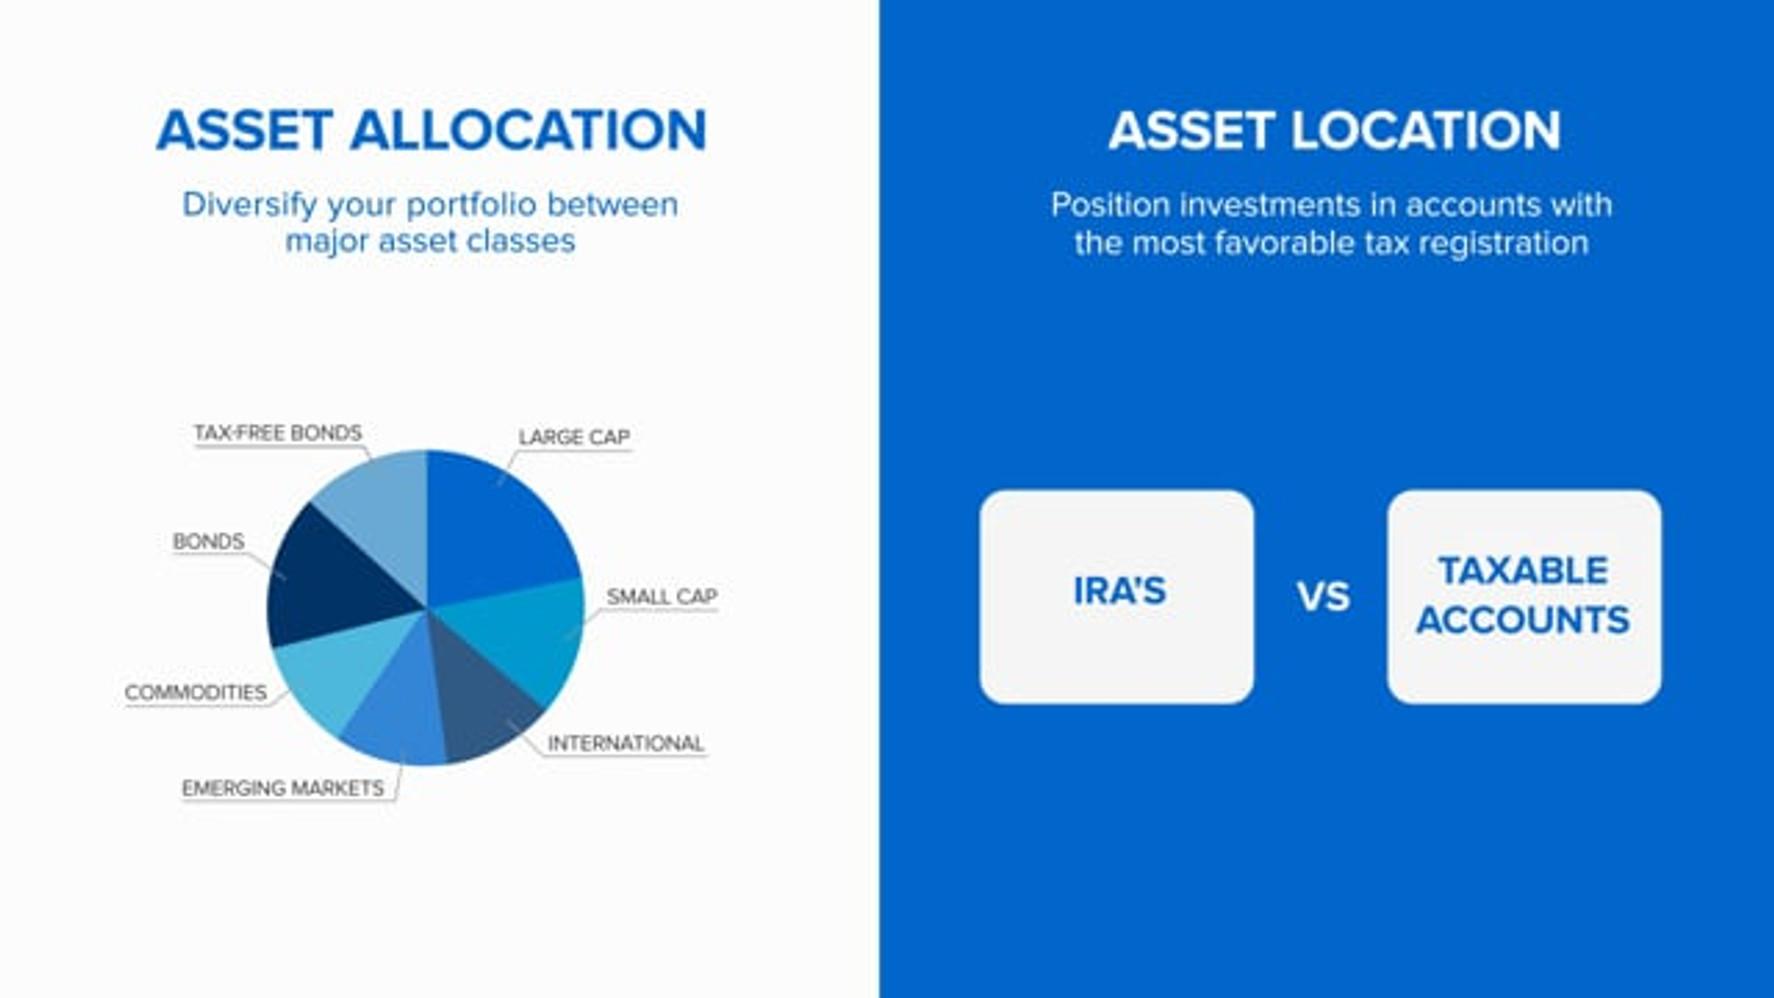 The Asset Allocation Vs. Asset Location